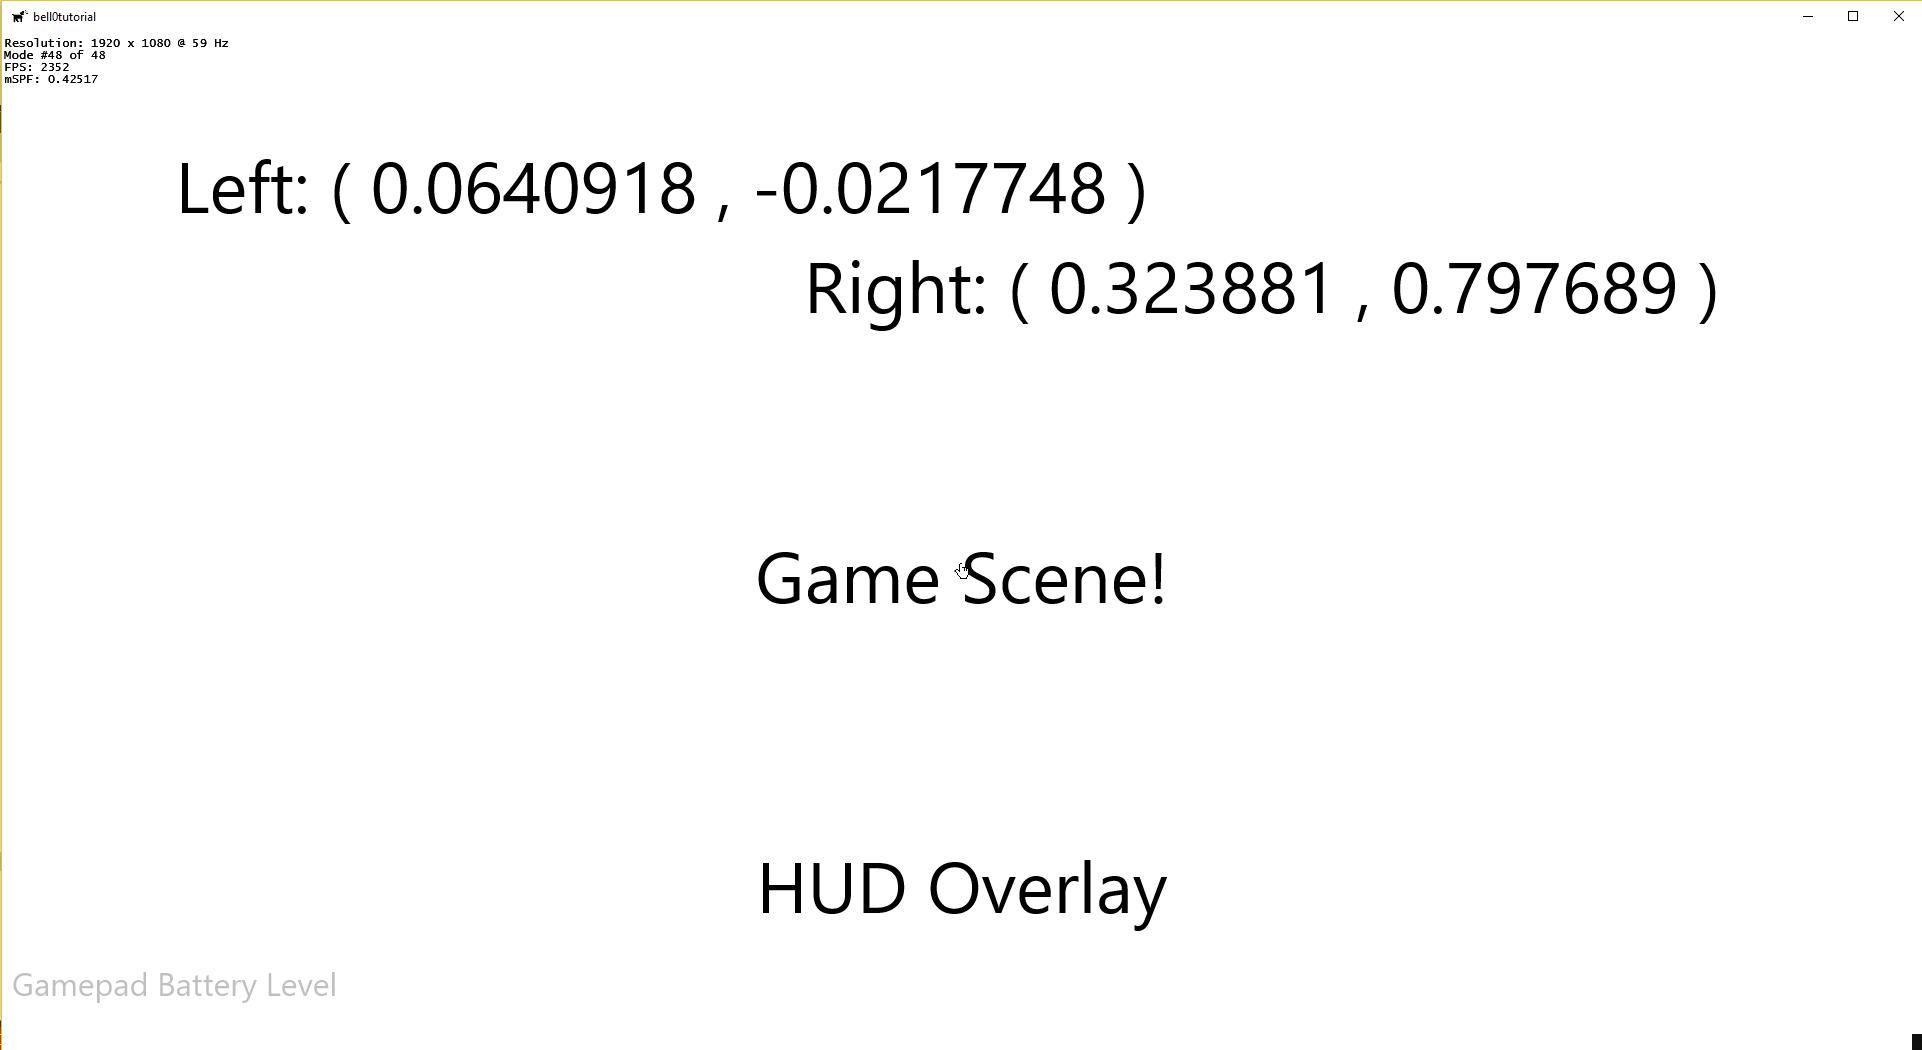 DirectX Tutorial: XInput and Gamepads